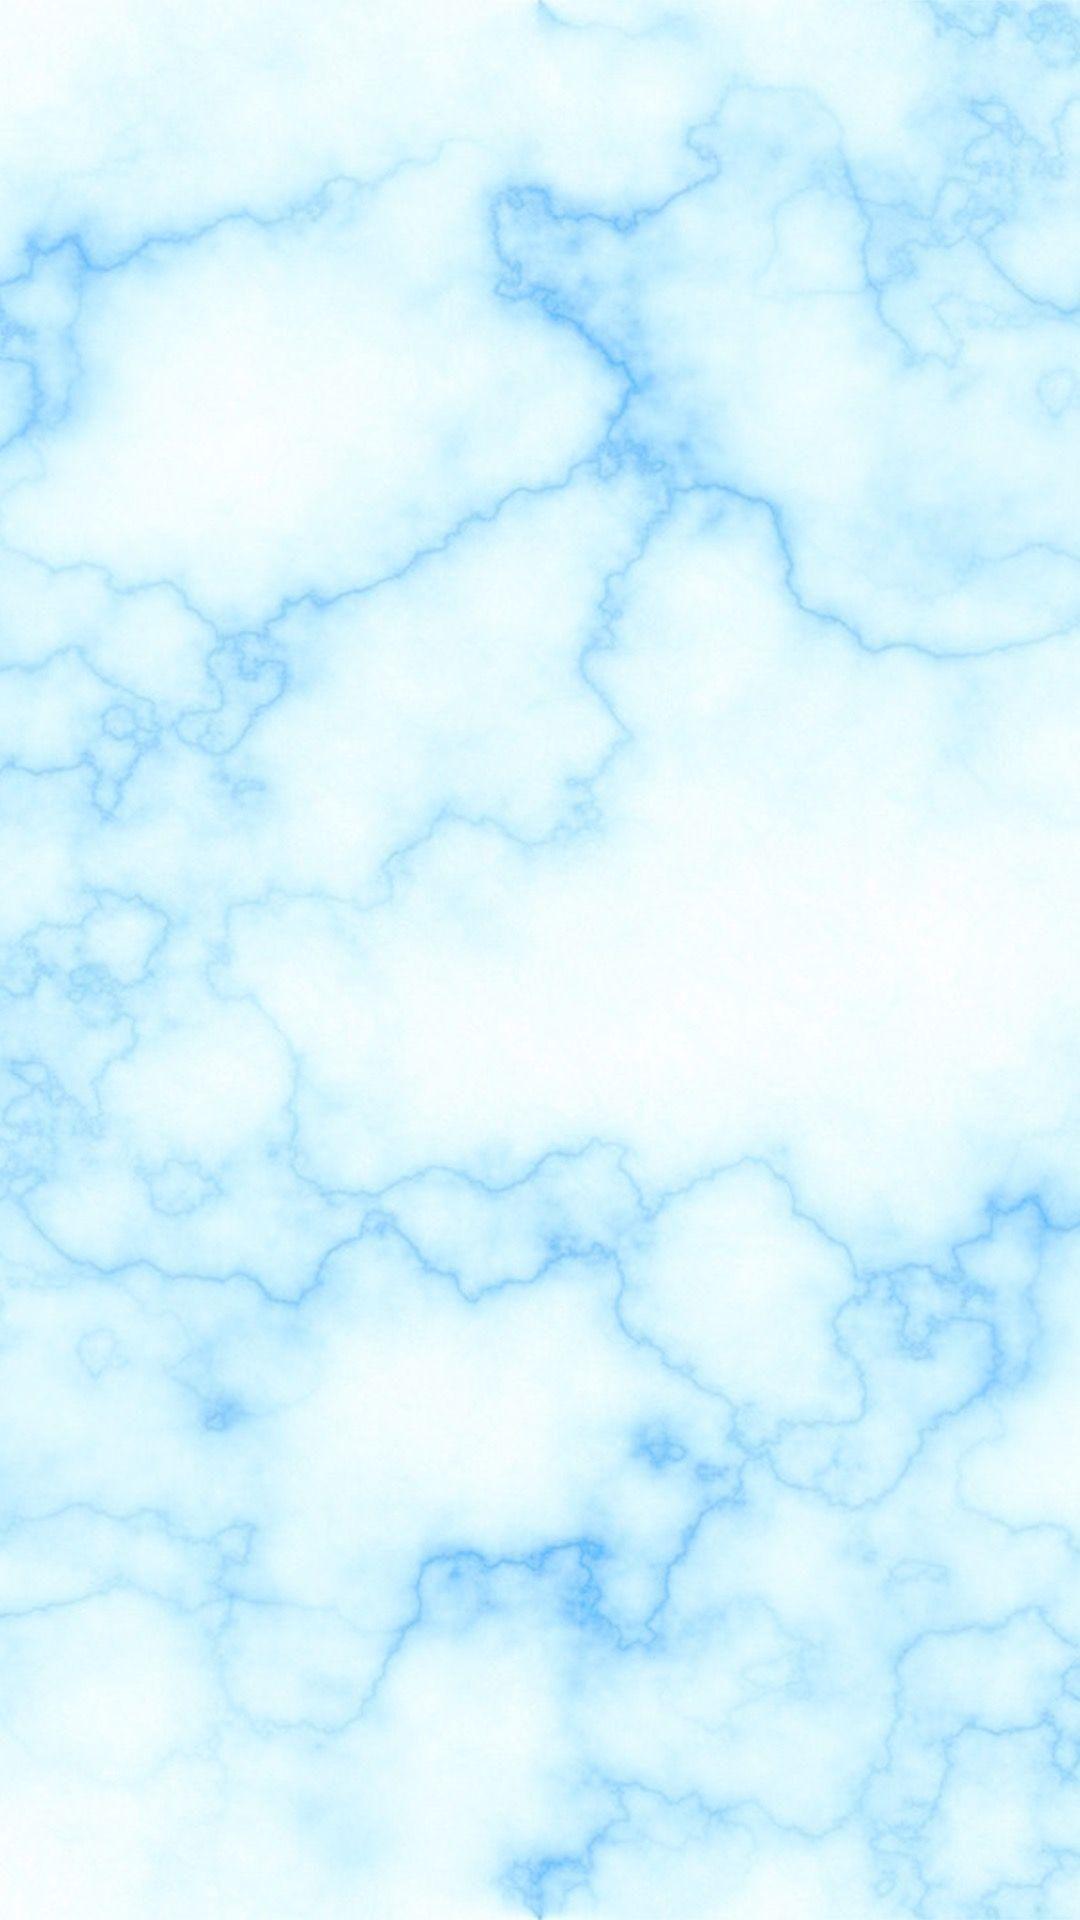 Aesthetic Navy Blue And Gold Phone Wallpaper Blue Marble Wallpaper Marble Wallpaper Phone Iphone Wallpaper Glitter